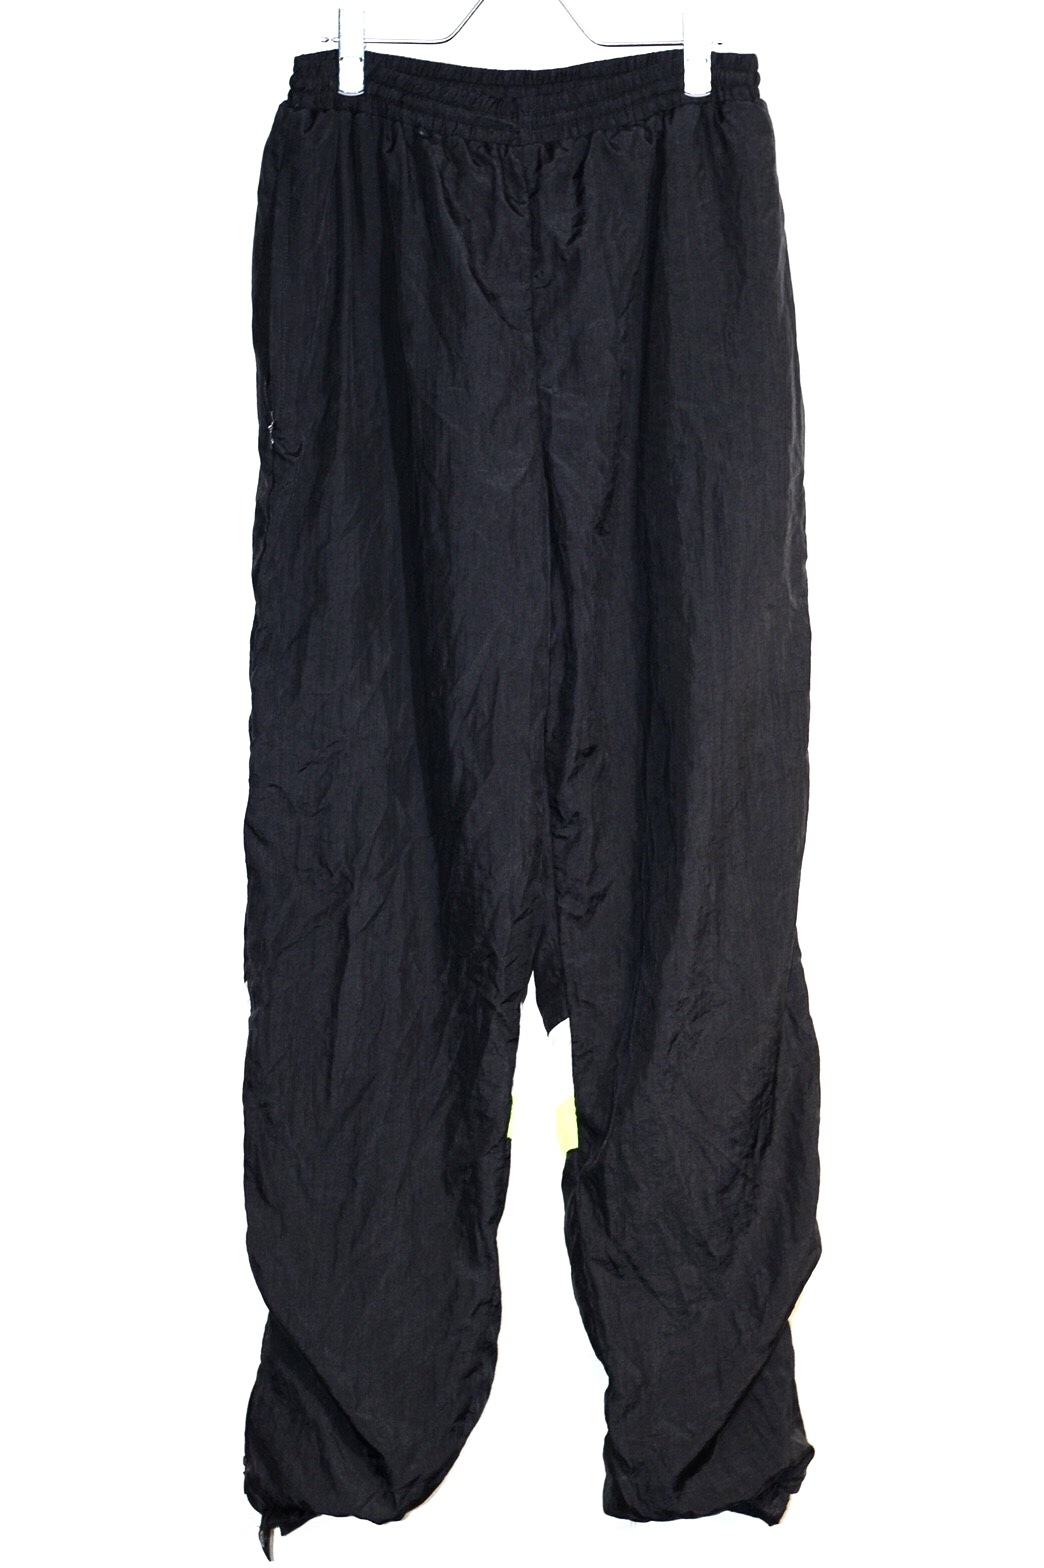 GIVENCHY nylon pants